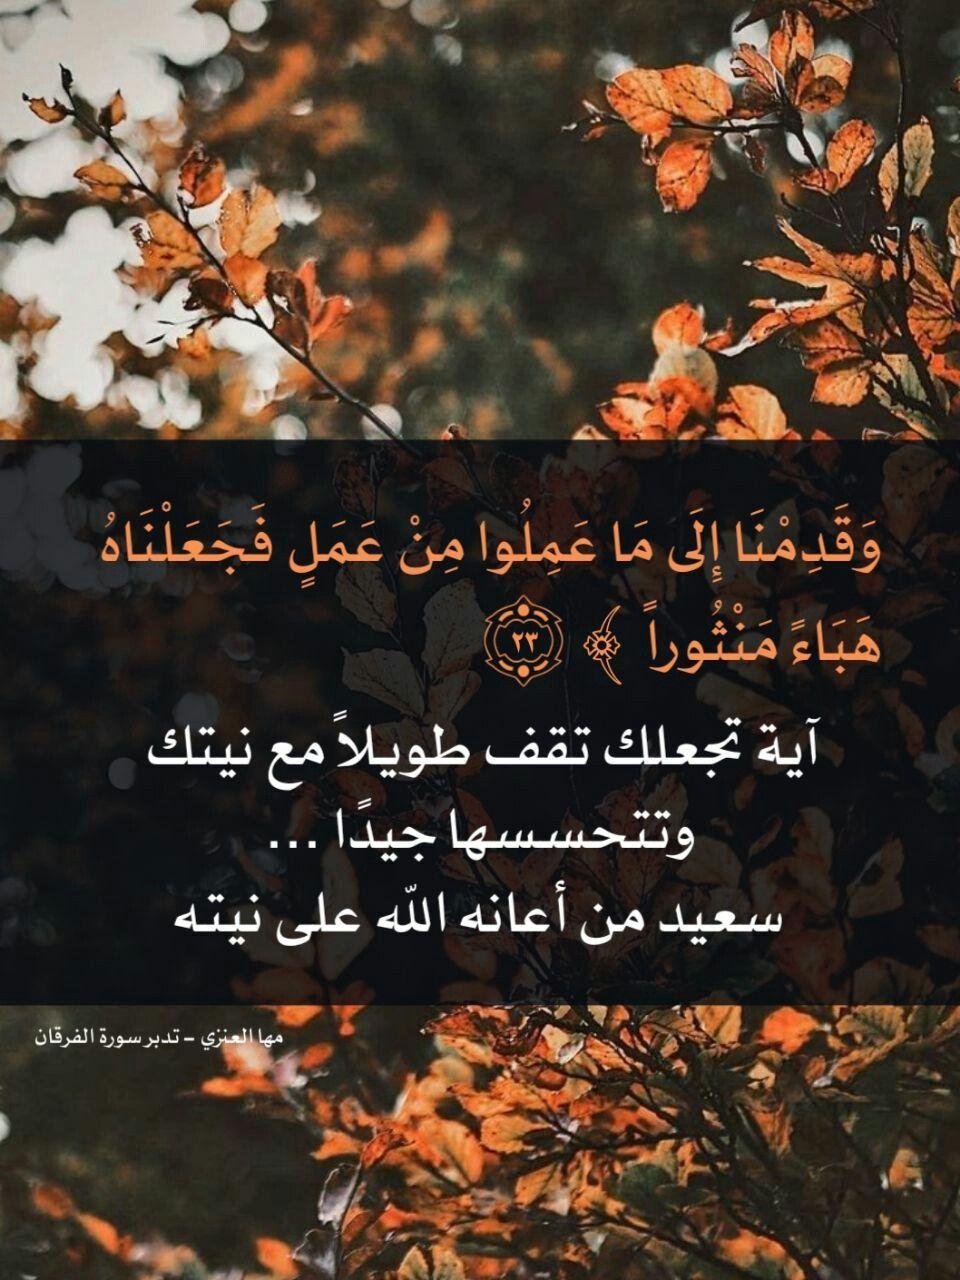 Pin By راقي الحرف On علاج لكل شيء Islamic Love Quotes Islamic Quotes Islam Quran